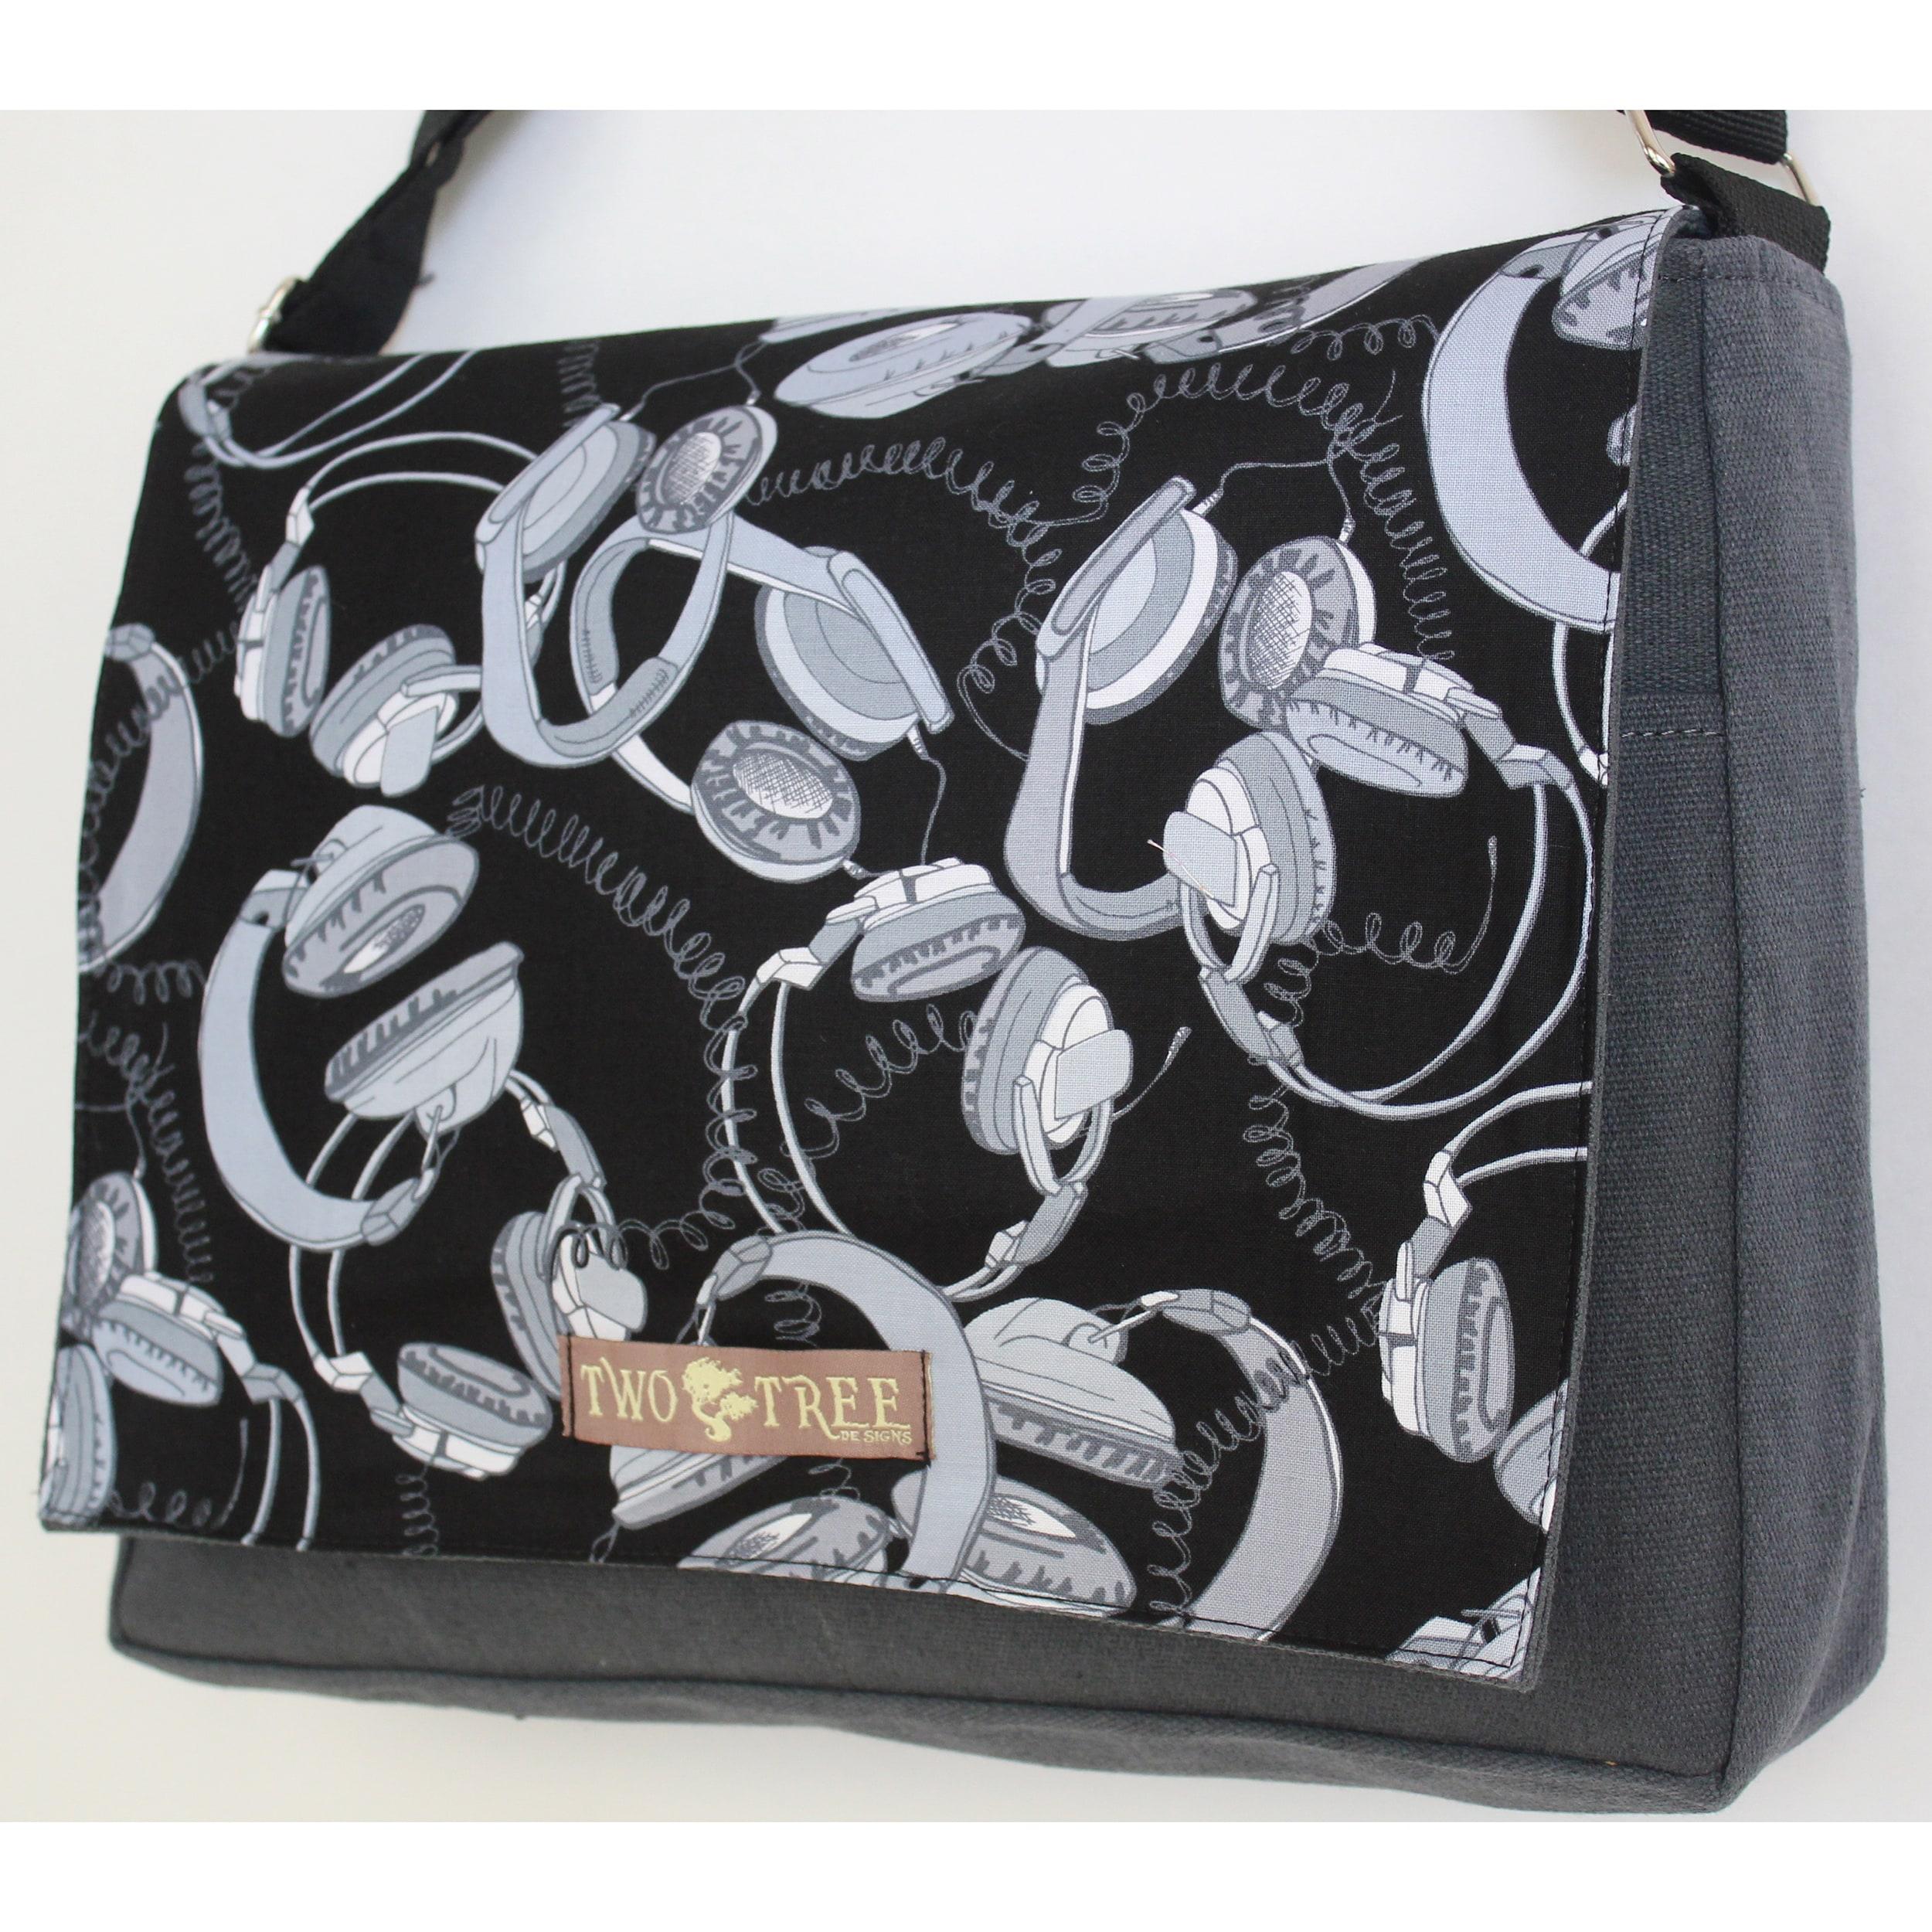 Two Tree Designs Retro Headphones Handmade Messenger Bag